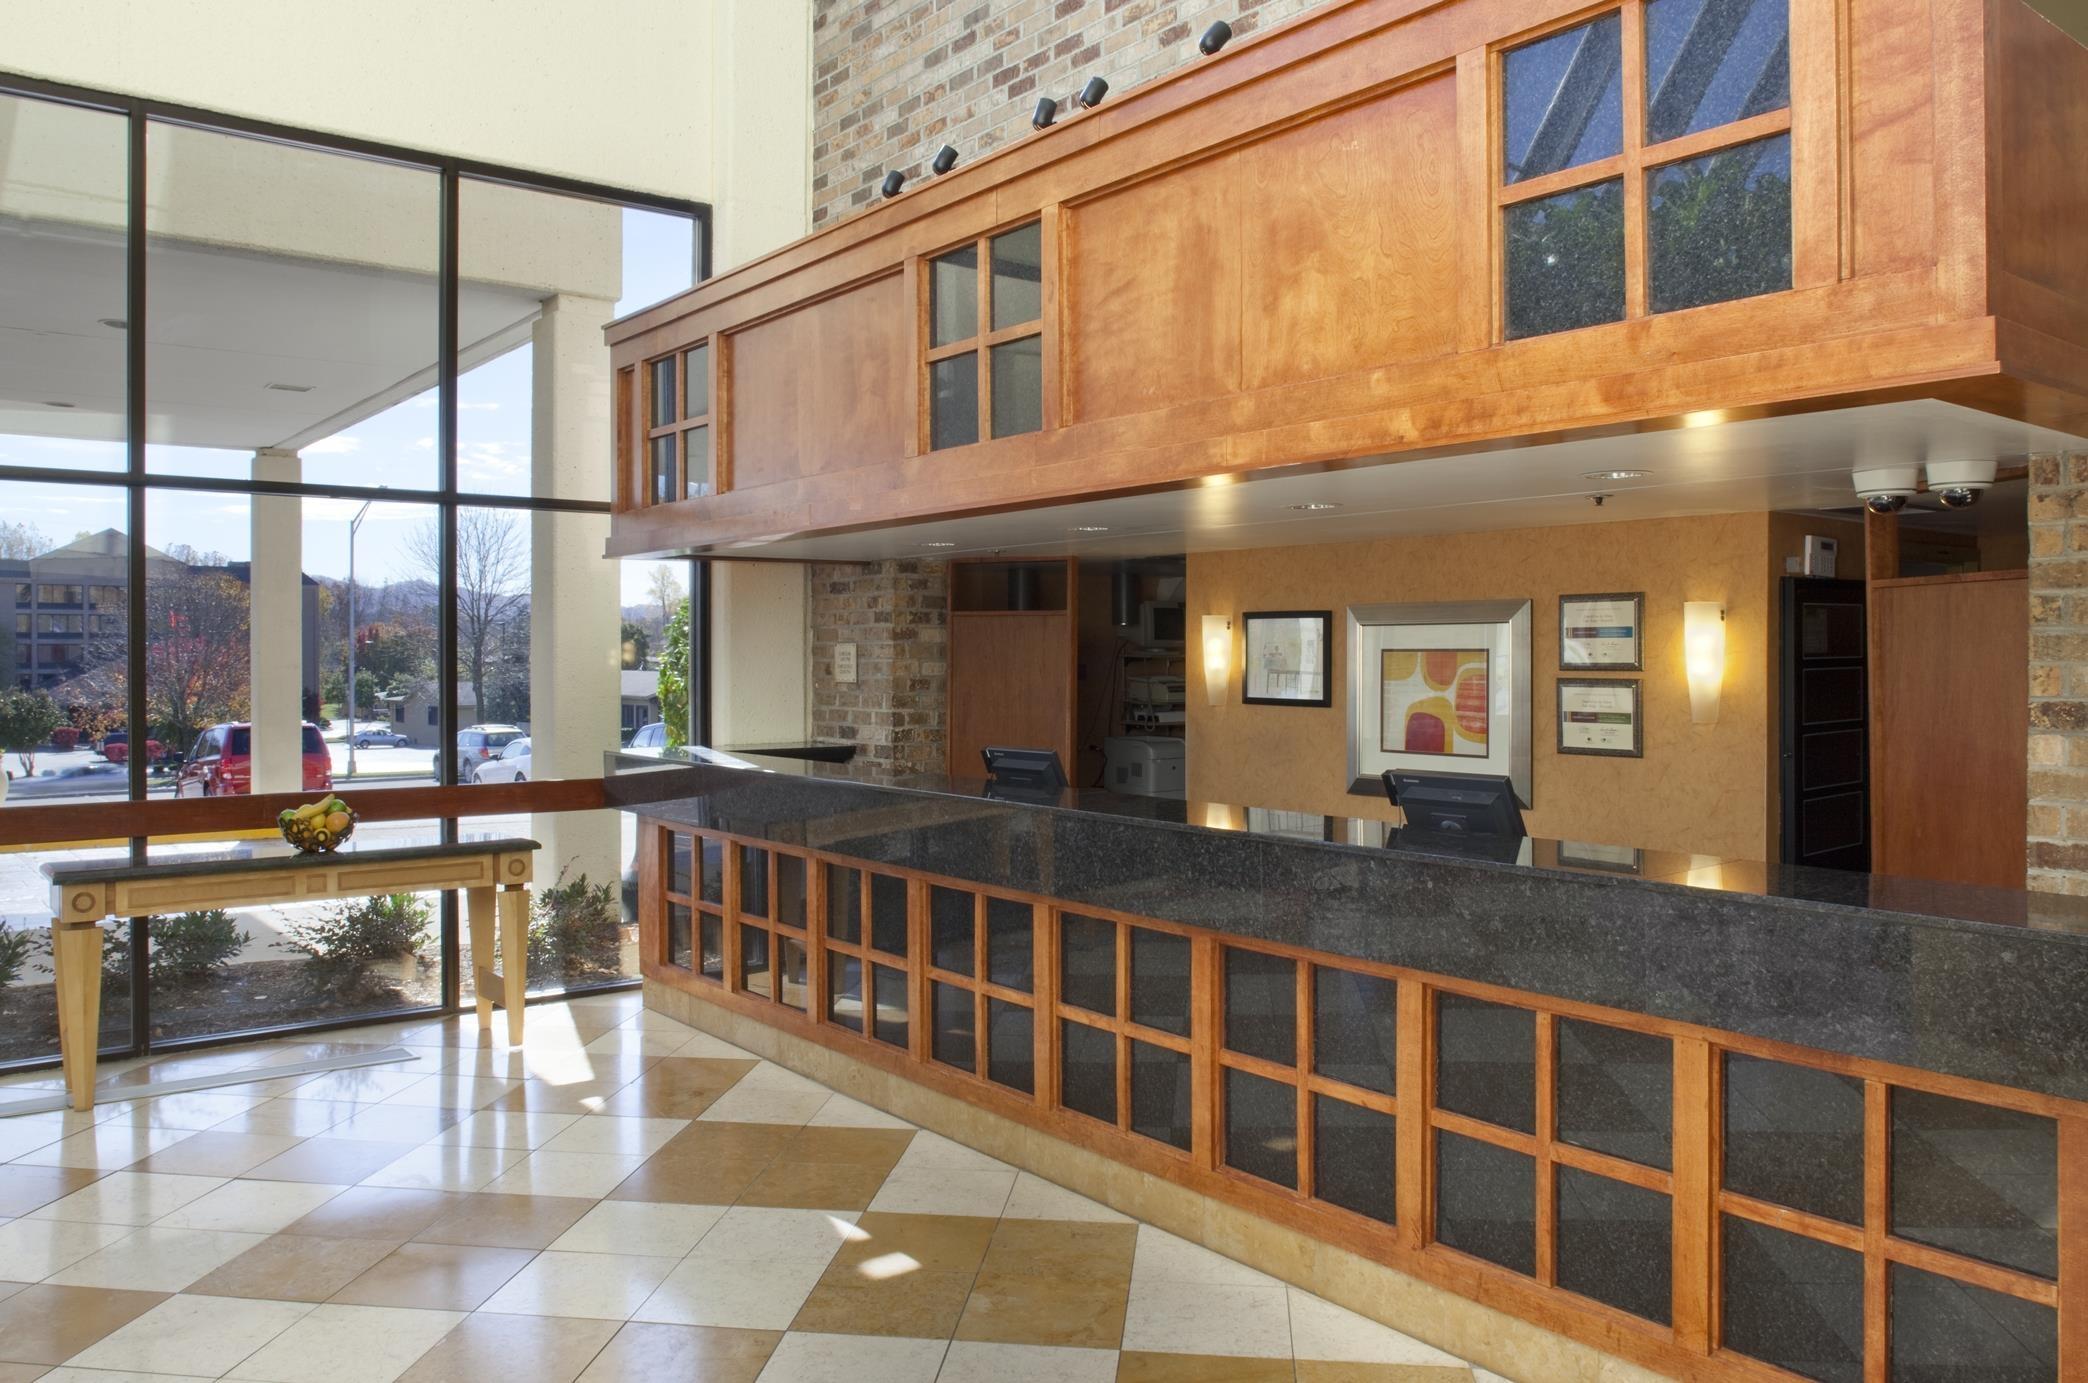 DoubleTree by Hilton Hotel Oak Ridge - Knoxville image 2